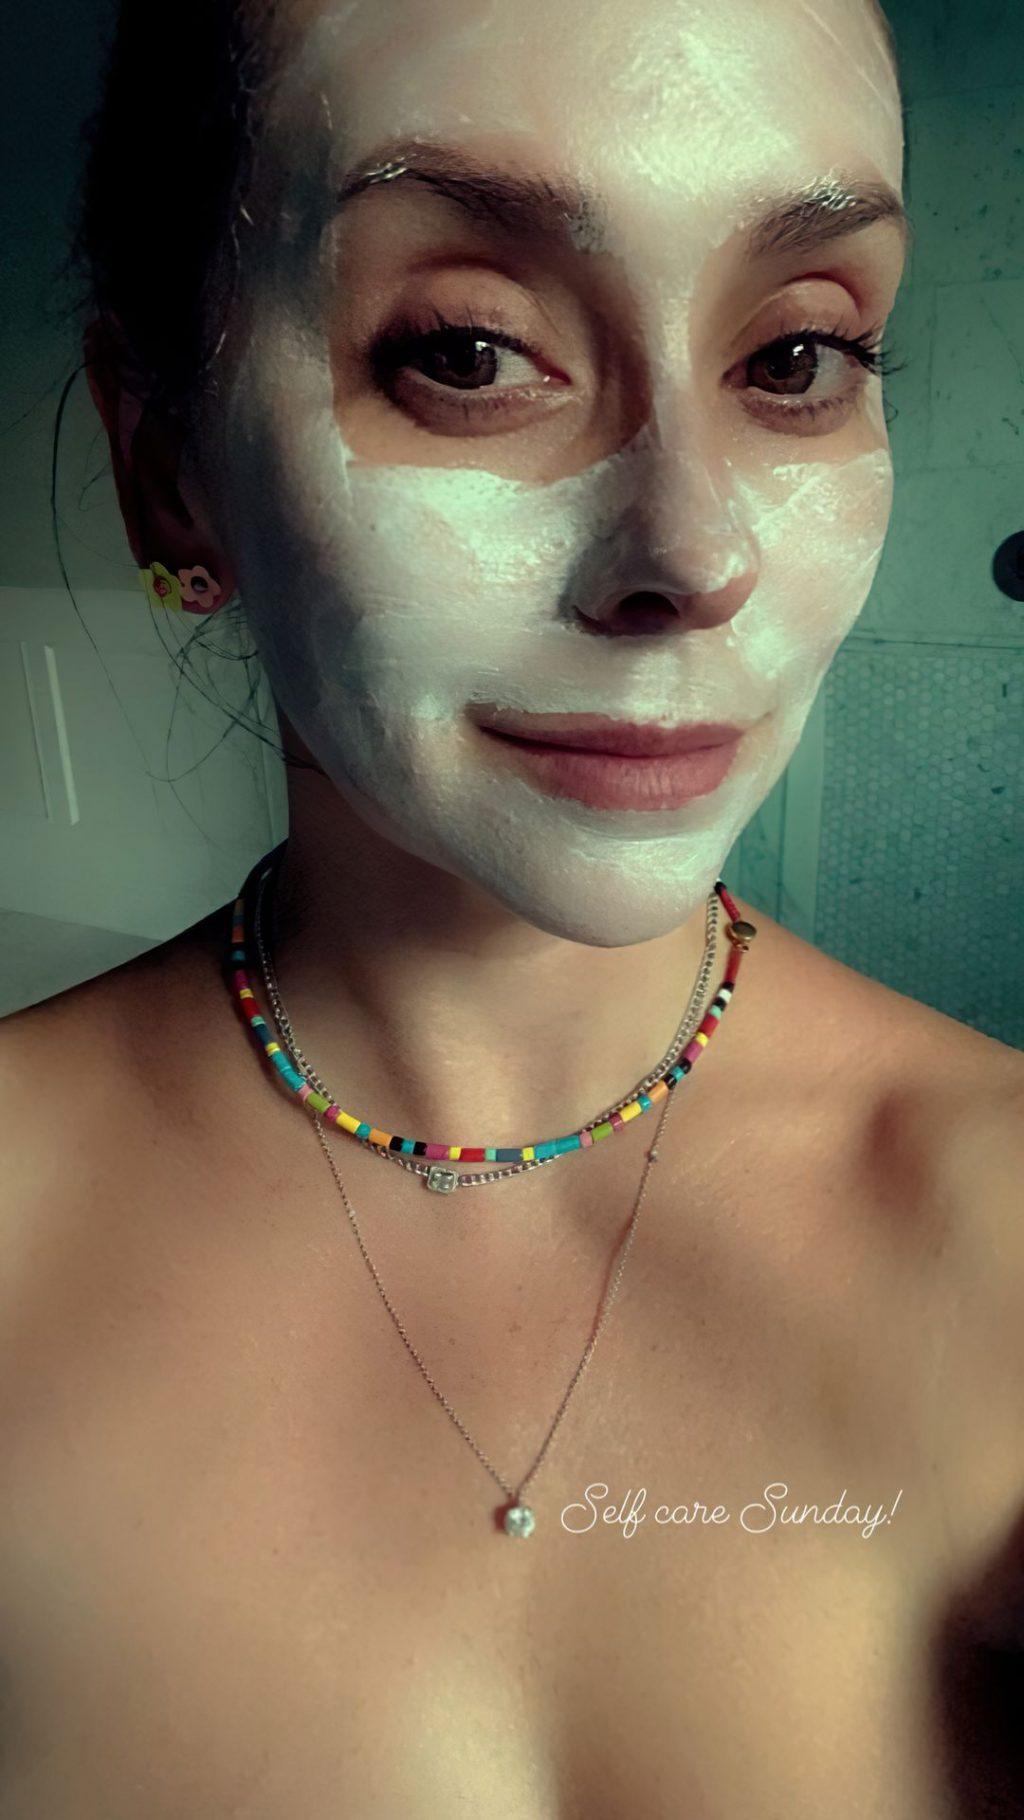 Jennifer Love Hewitt Topless (1 Photo)